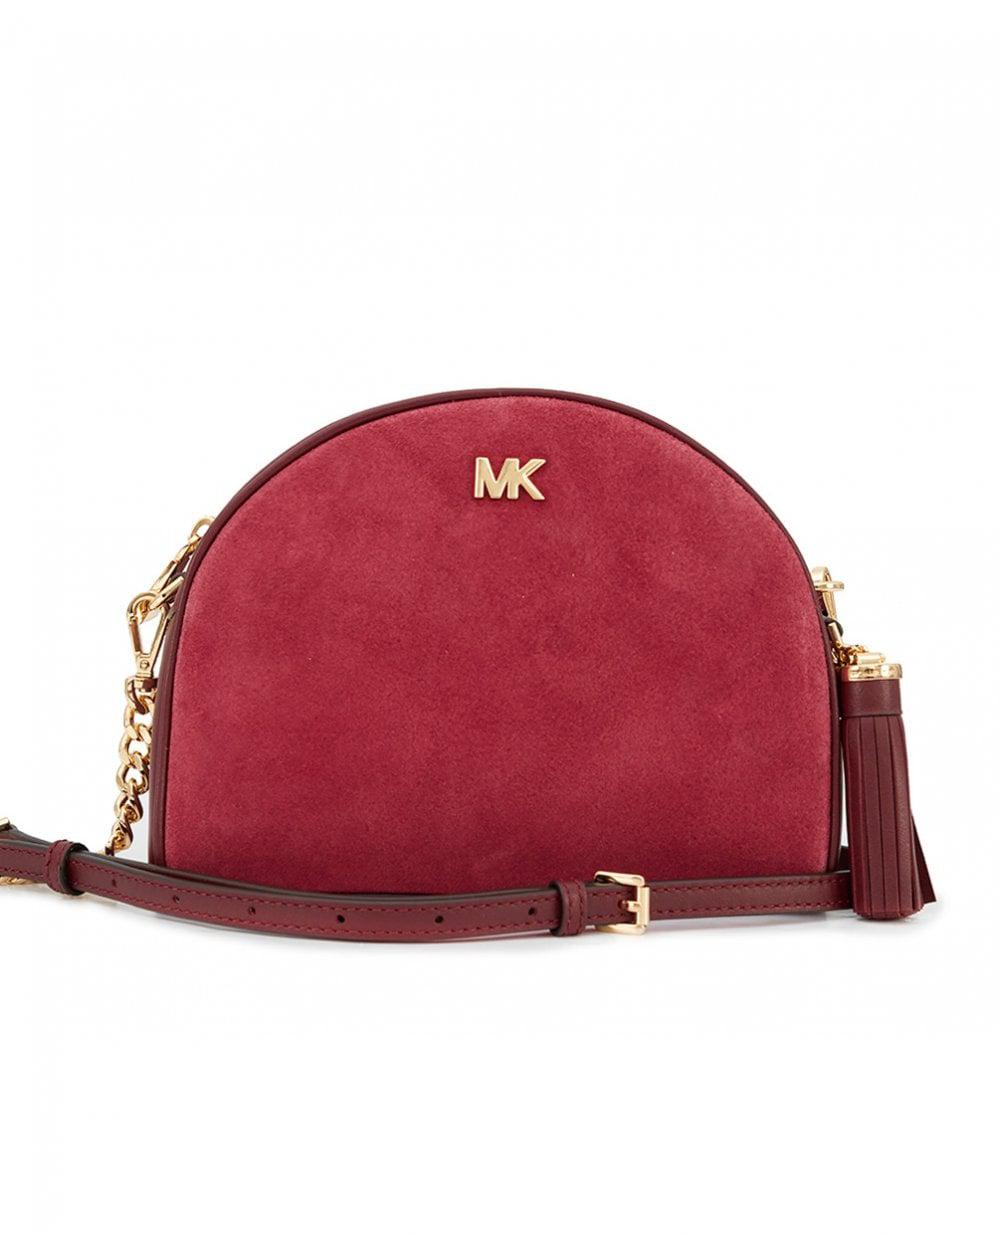 231145fd4e Michael Kors Medium Half Moon Suede Bag in Red - Lyst